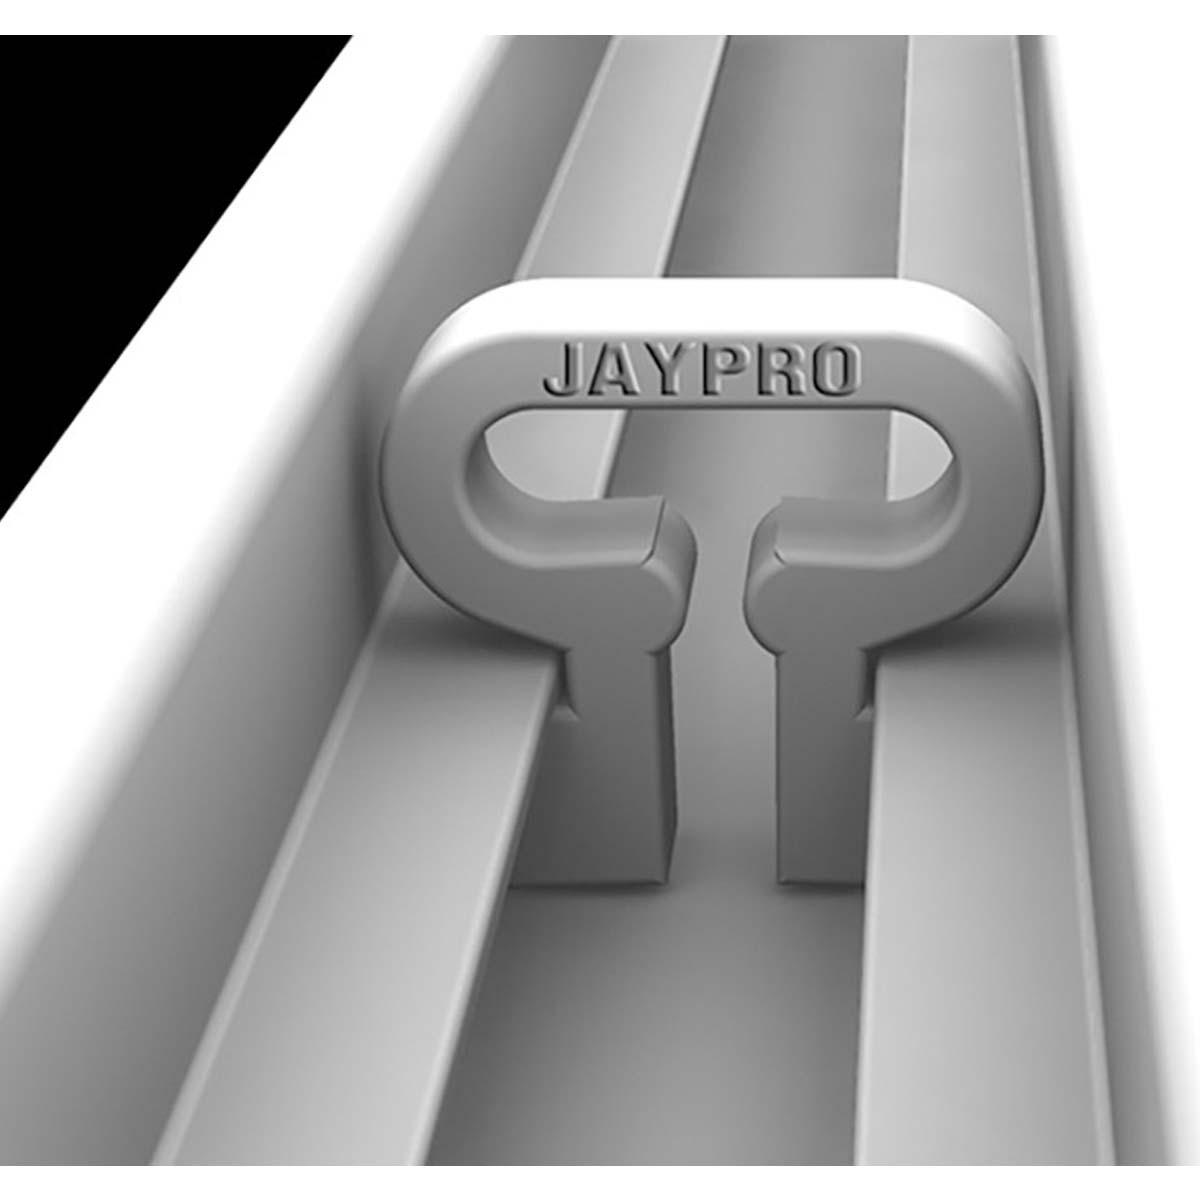 jaypro nova club goals round 6 39 6 h x 18 39 6 w pair. Black Bedroom Furniture Sets. Home Design Ideas